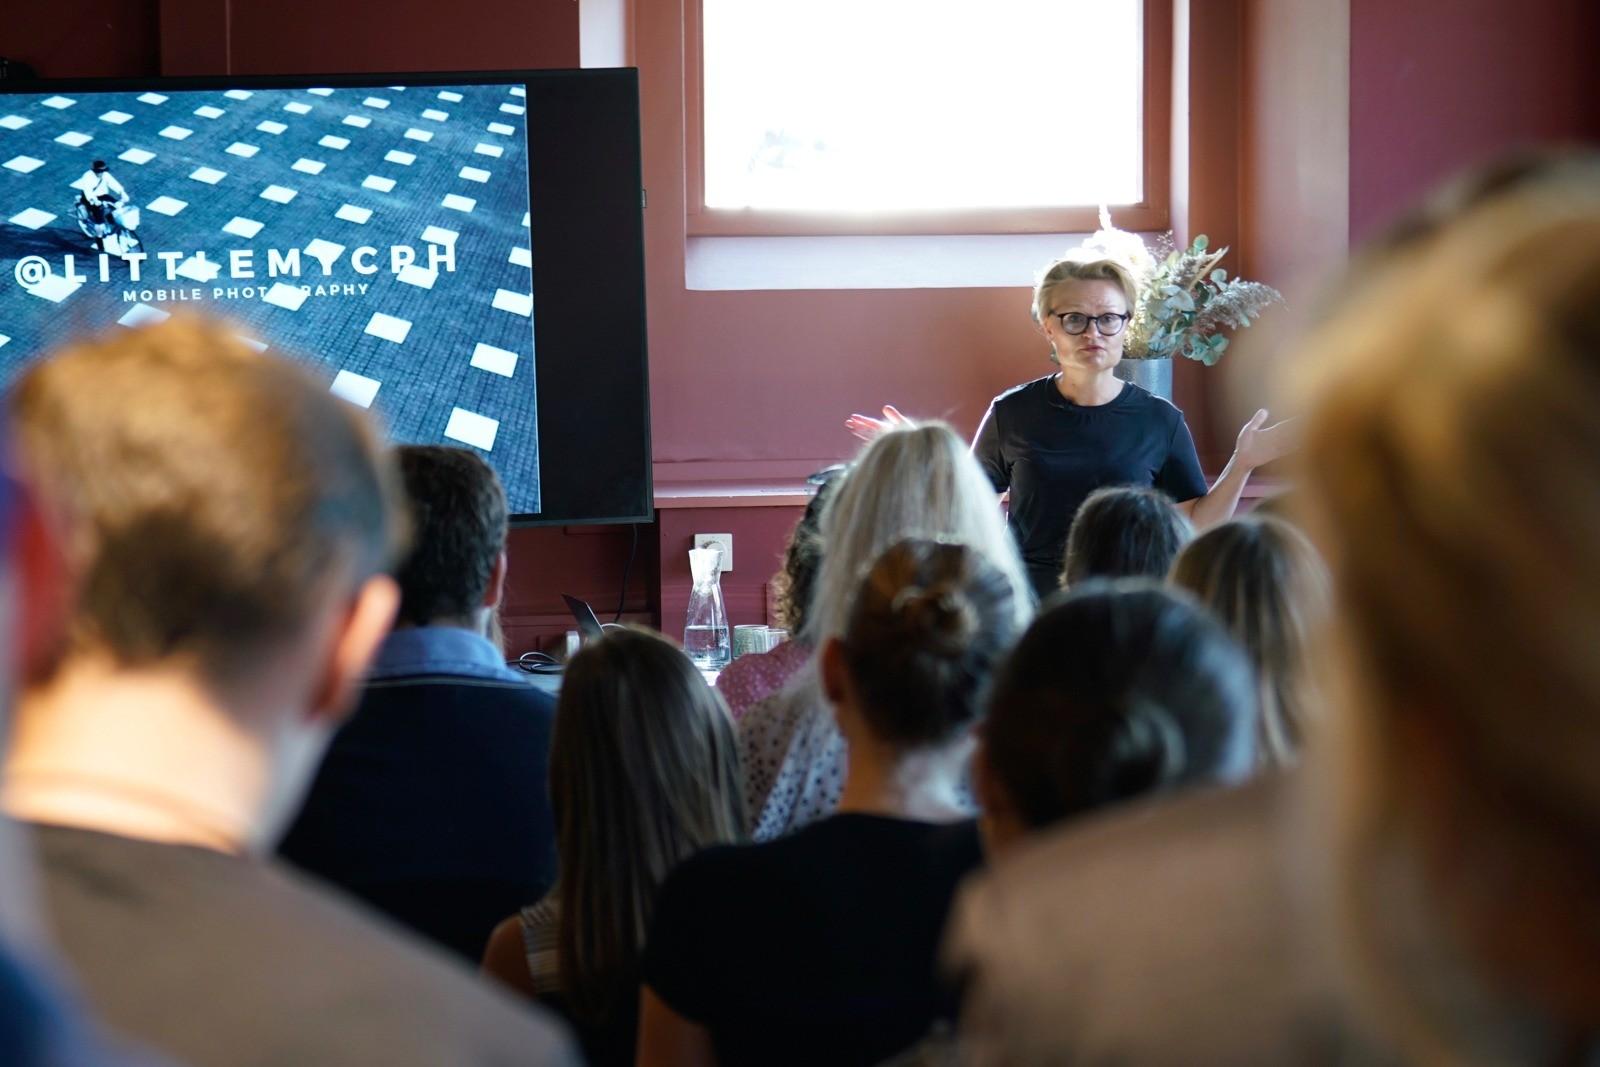 Event fotografering: Mette Willert - dagens taler - skudt med Lomography Neptune